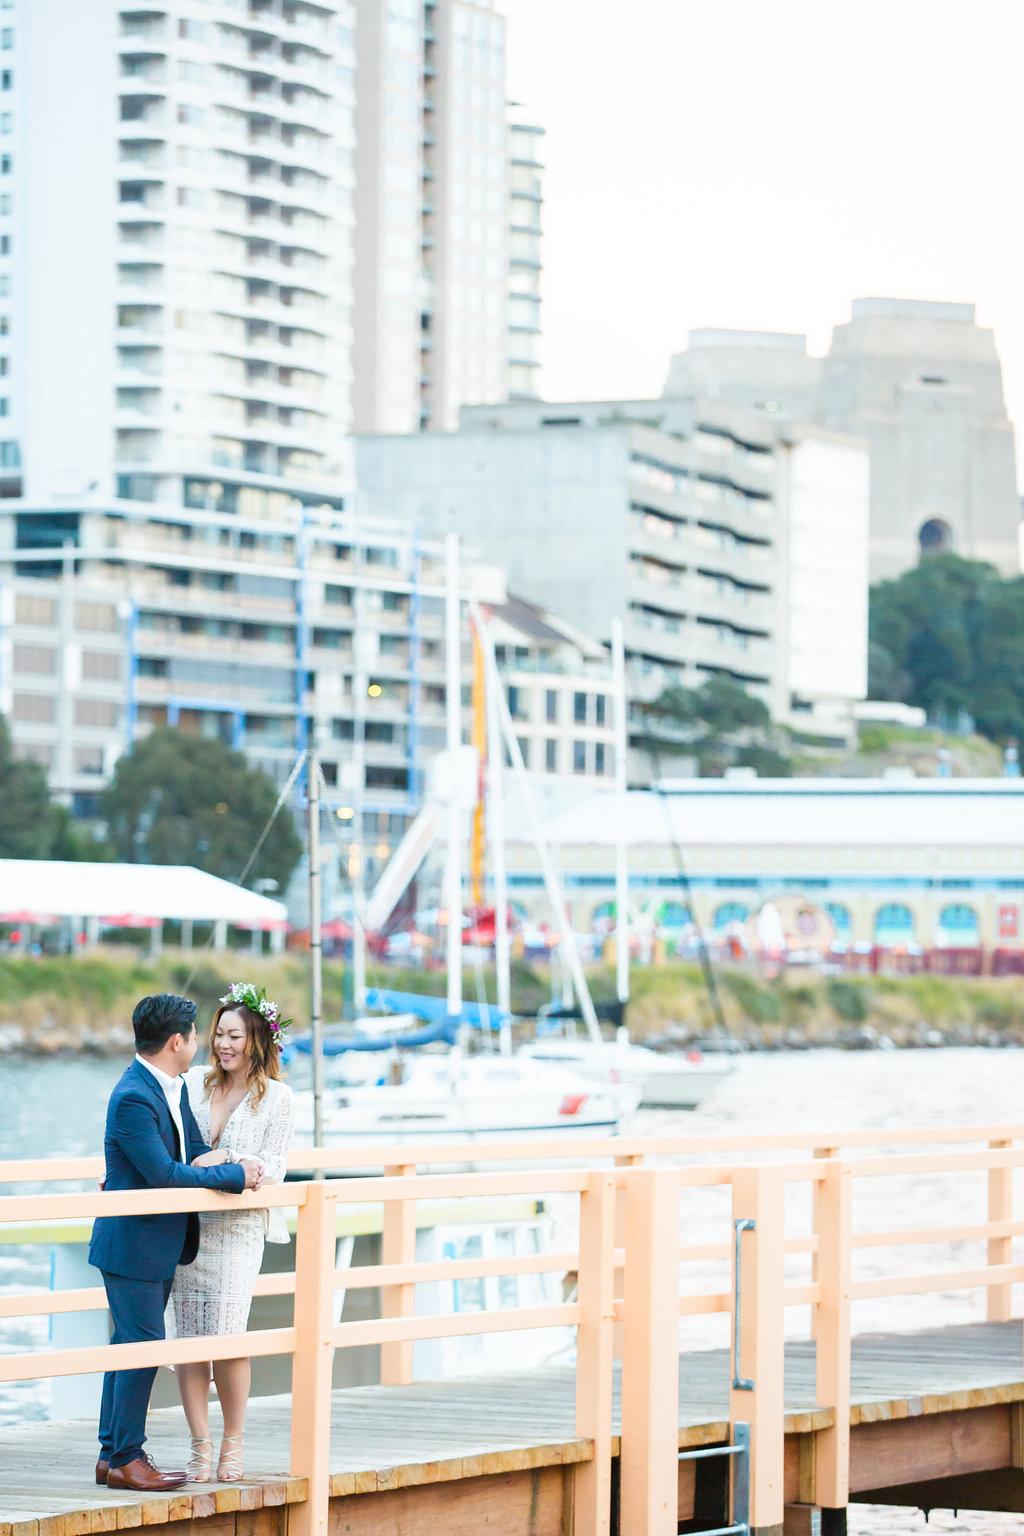 Sydney Wedding Photographer - Lavender Bay - Jennifer Lam Photography (21).jpg